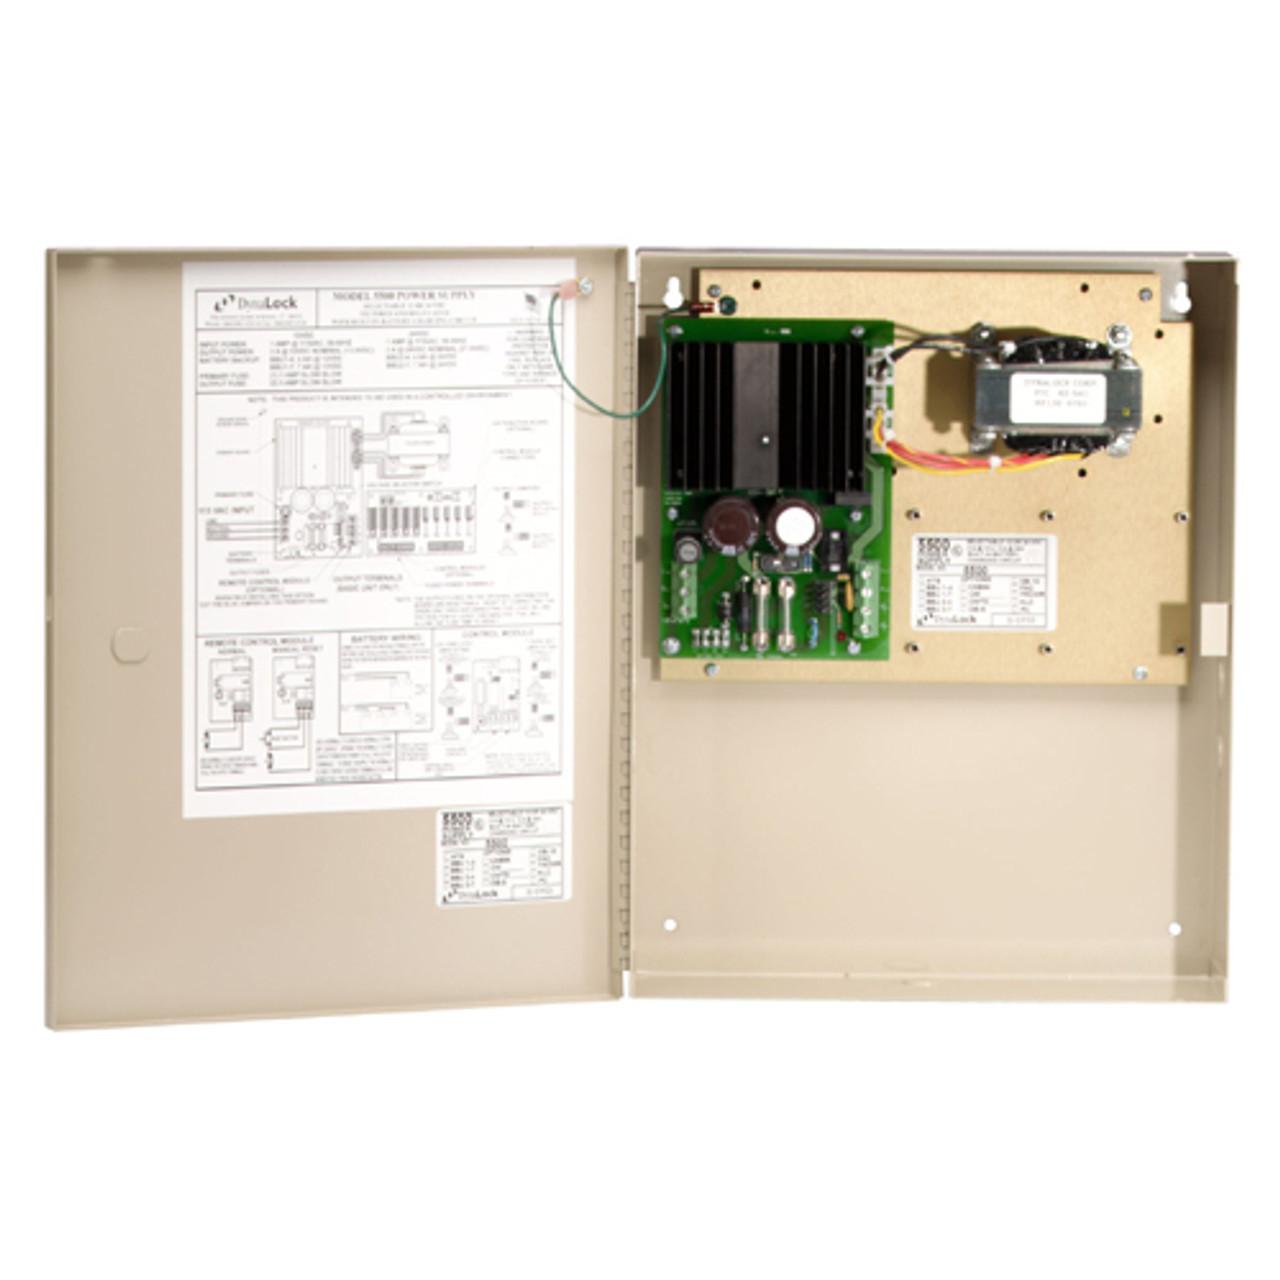 5500-FAC-PC DynaLock Multi Zone Medium Duty Power Supply with Fire Alarm Module and Power cord